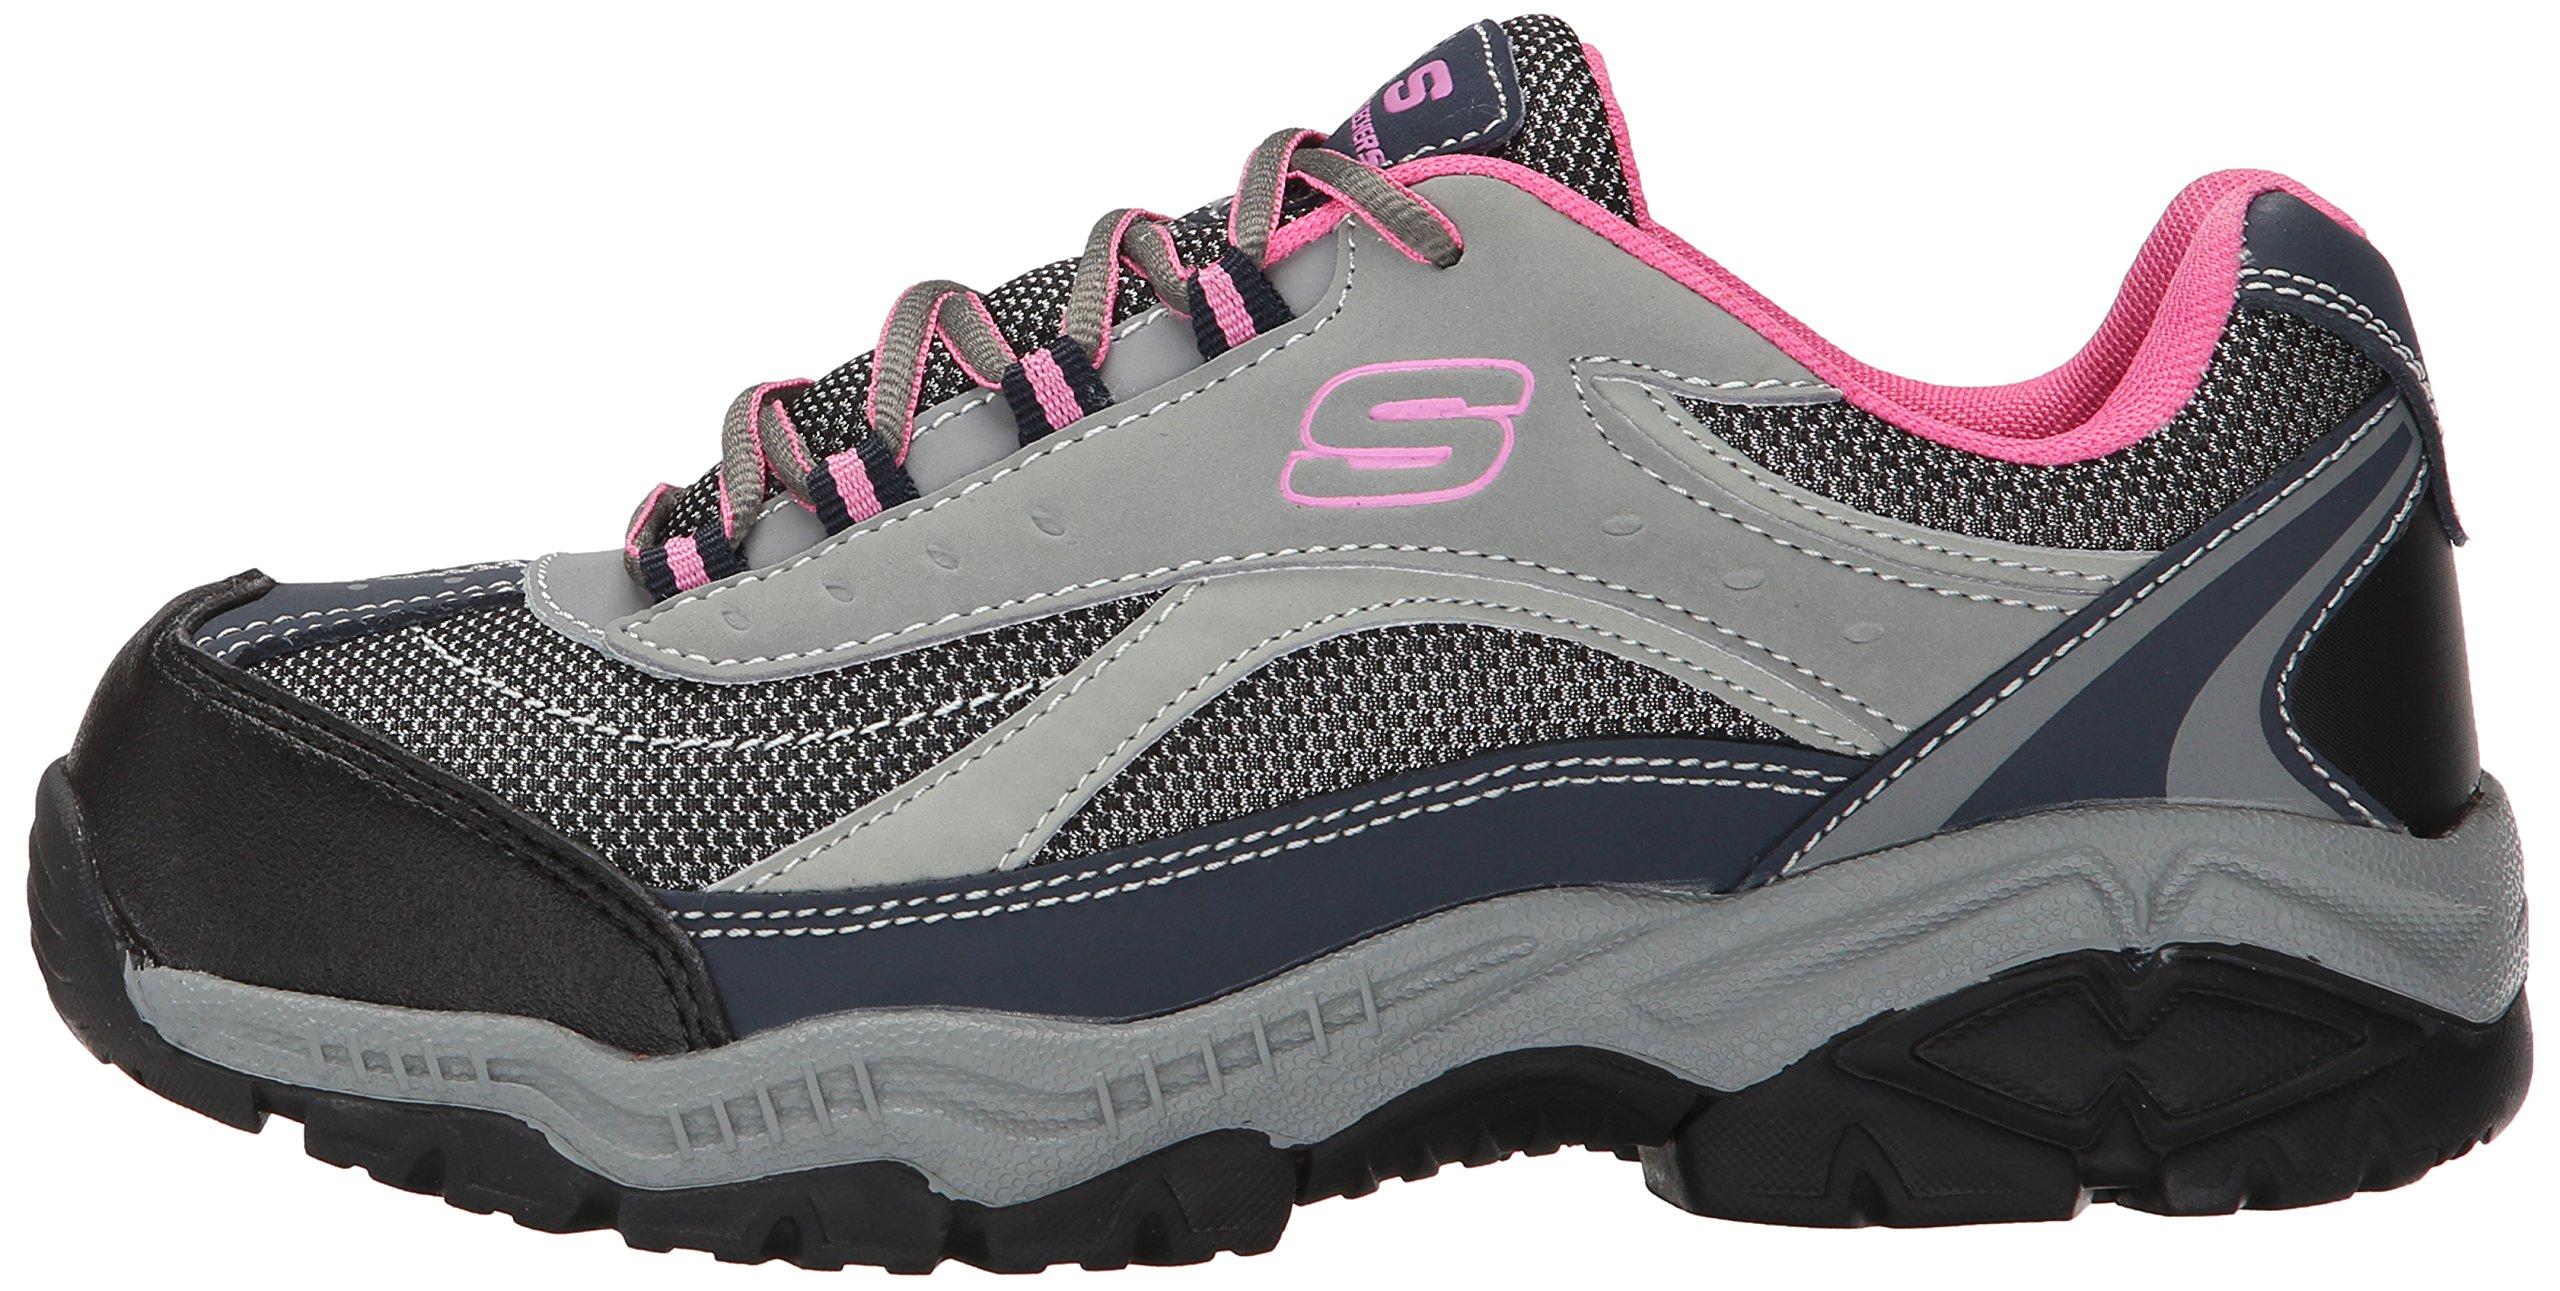 Skechers for Work Women's Doyline Hiker Boot, Gray Pink, 9 M US by Skechers (Image #5)